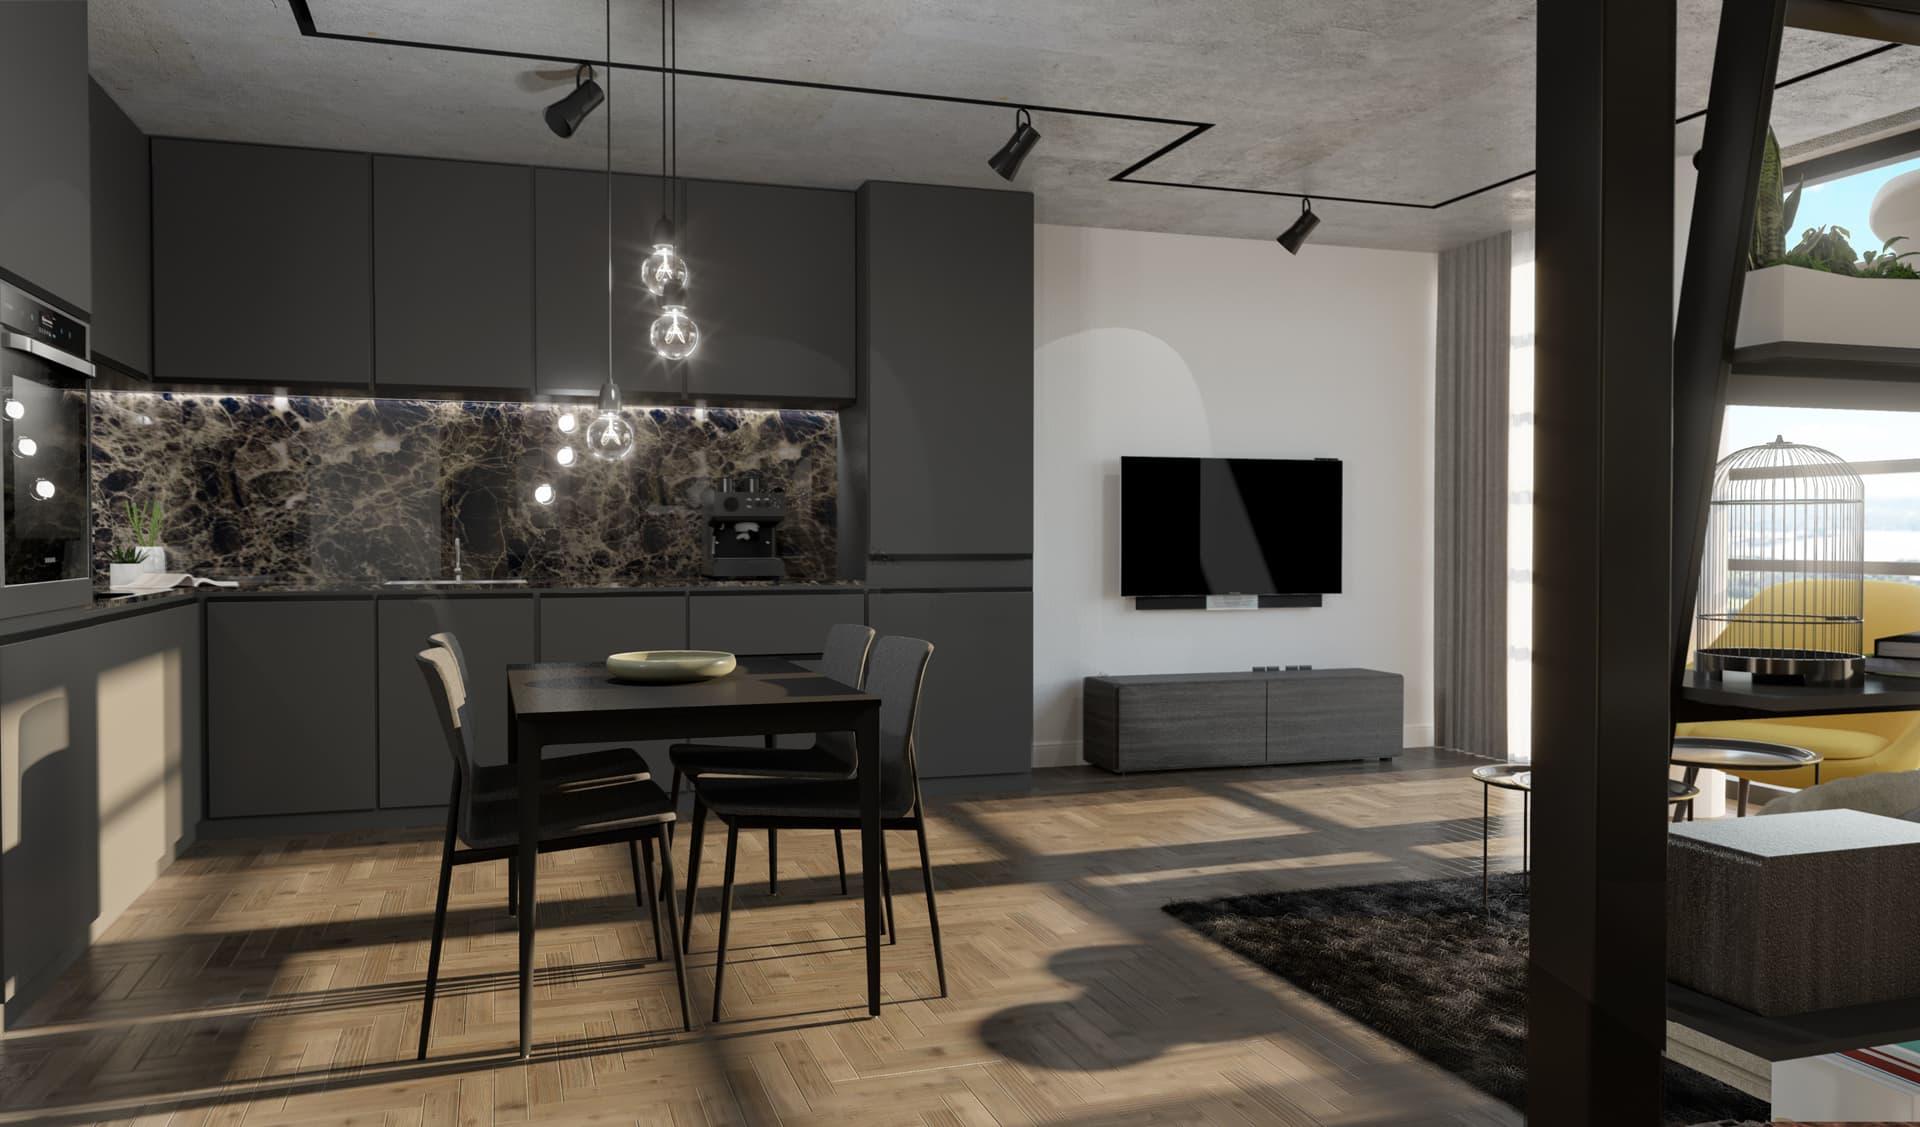 2/12 Dining Room, Loft, Design Package